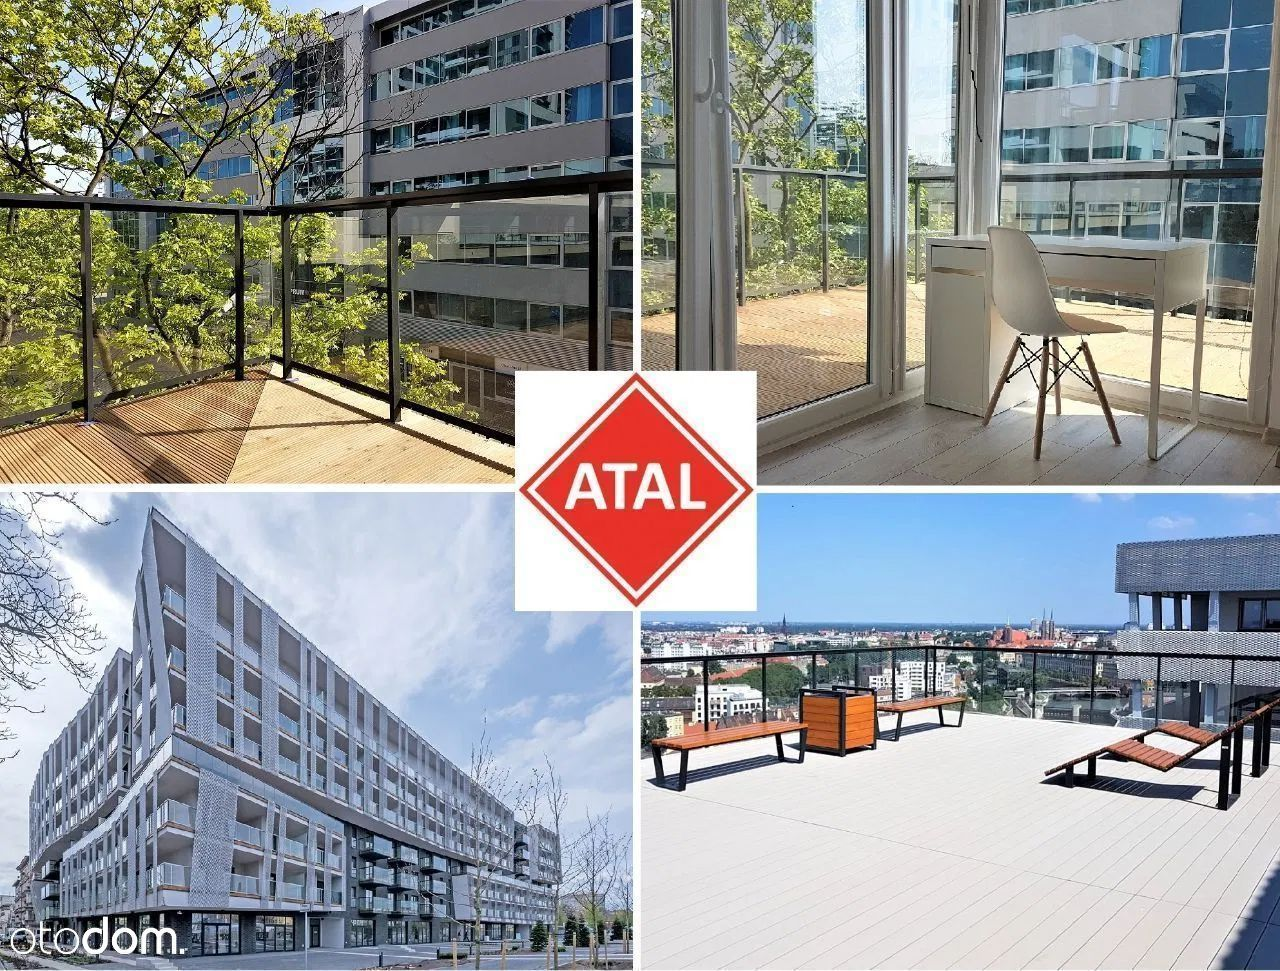 Atal Towers Centrum Pokój 1 osobowy